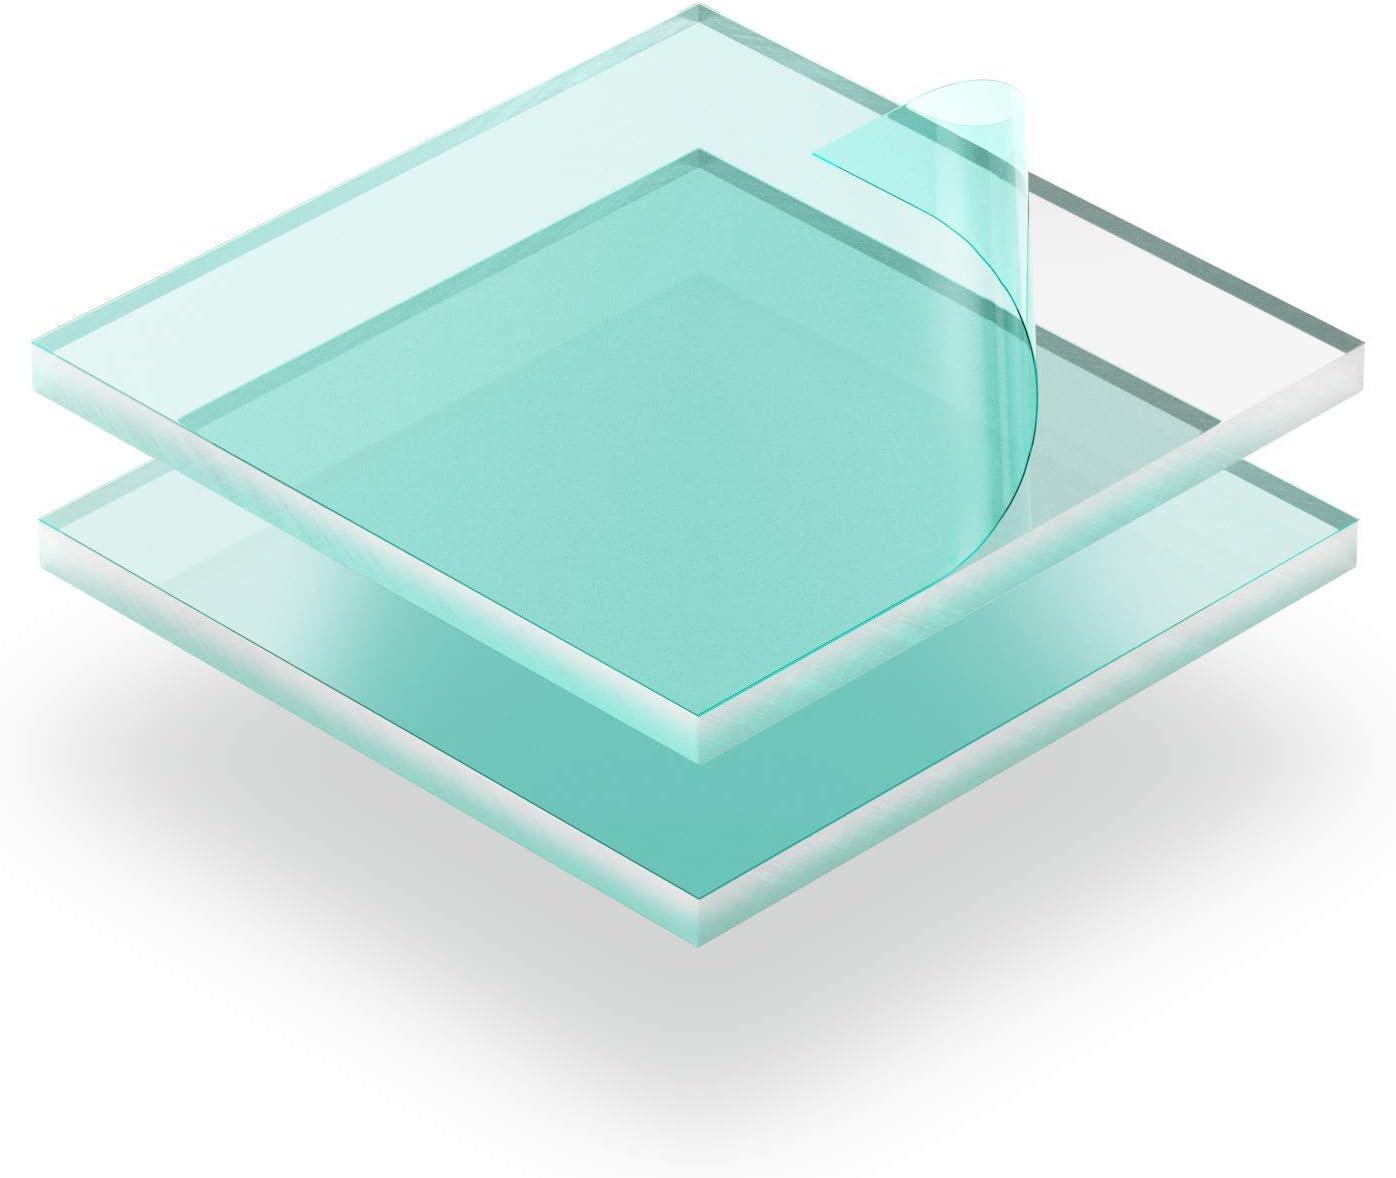 20 x 20 cm Kunststoffplattenonline.de Transparent 200 x 200 mm Acrylgas XT Platten//Acrylglasplatten XT 5mm im Zuschnitt